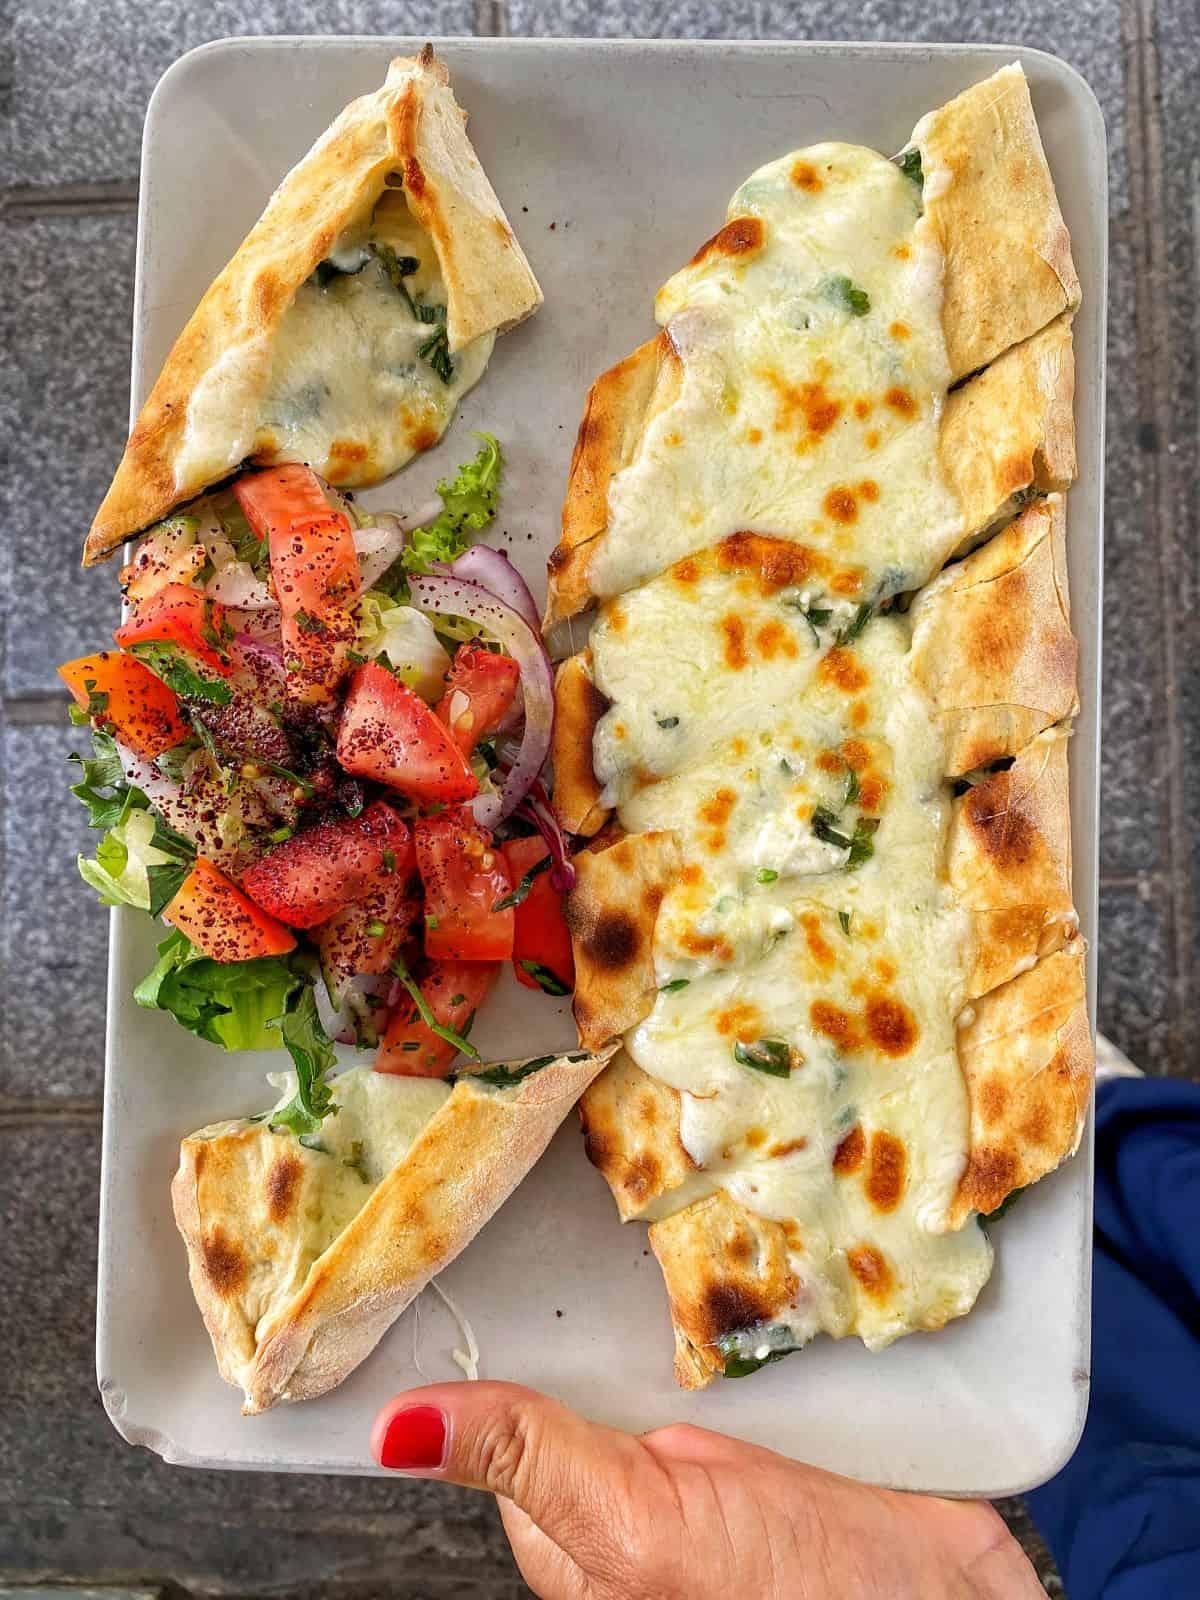 anatolia-village-restaurant-turque-paris-10-lahmacun